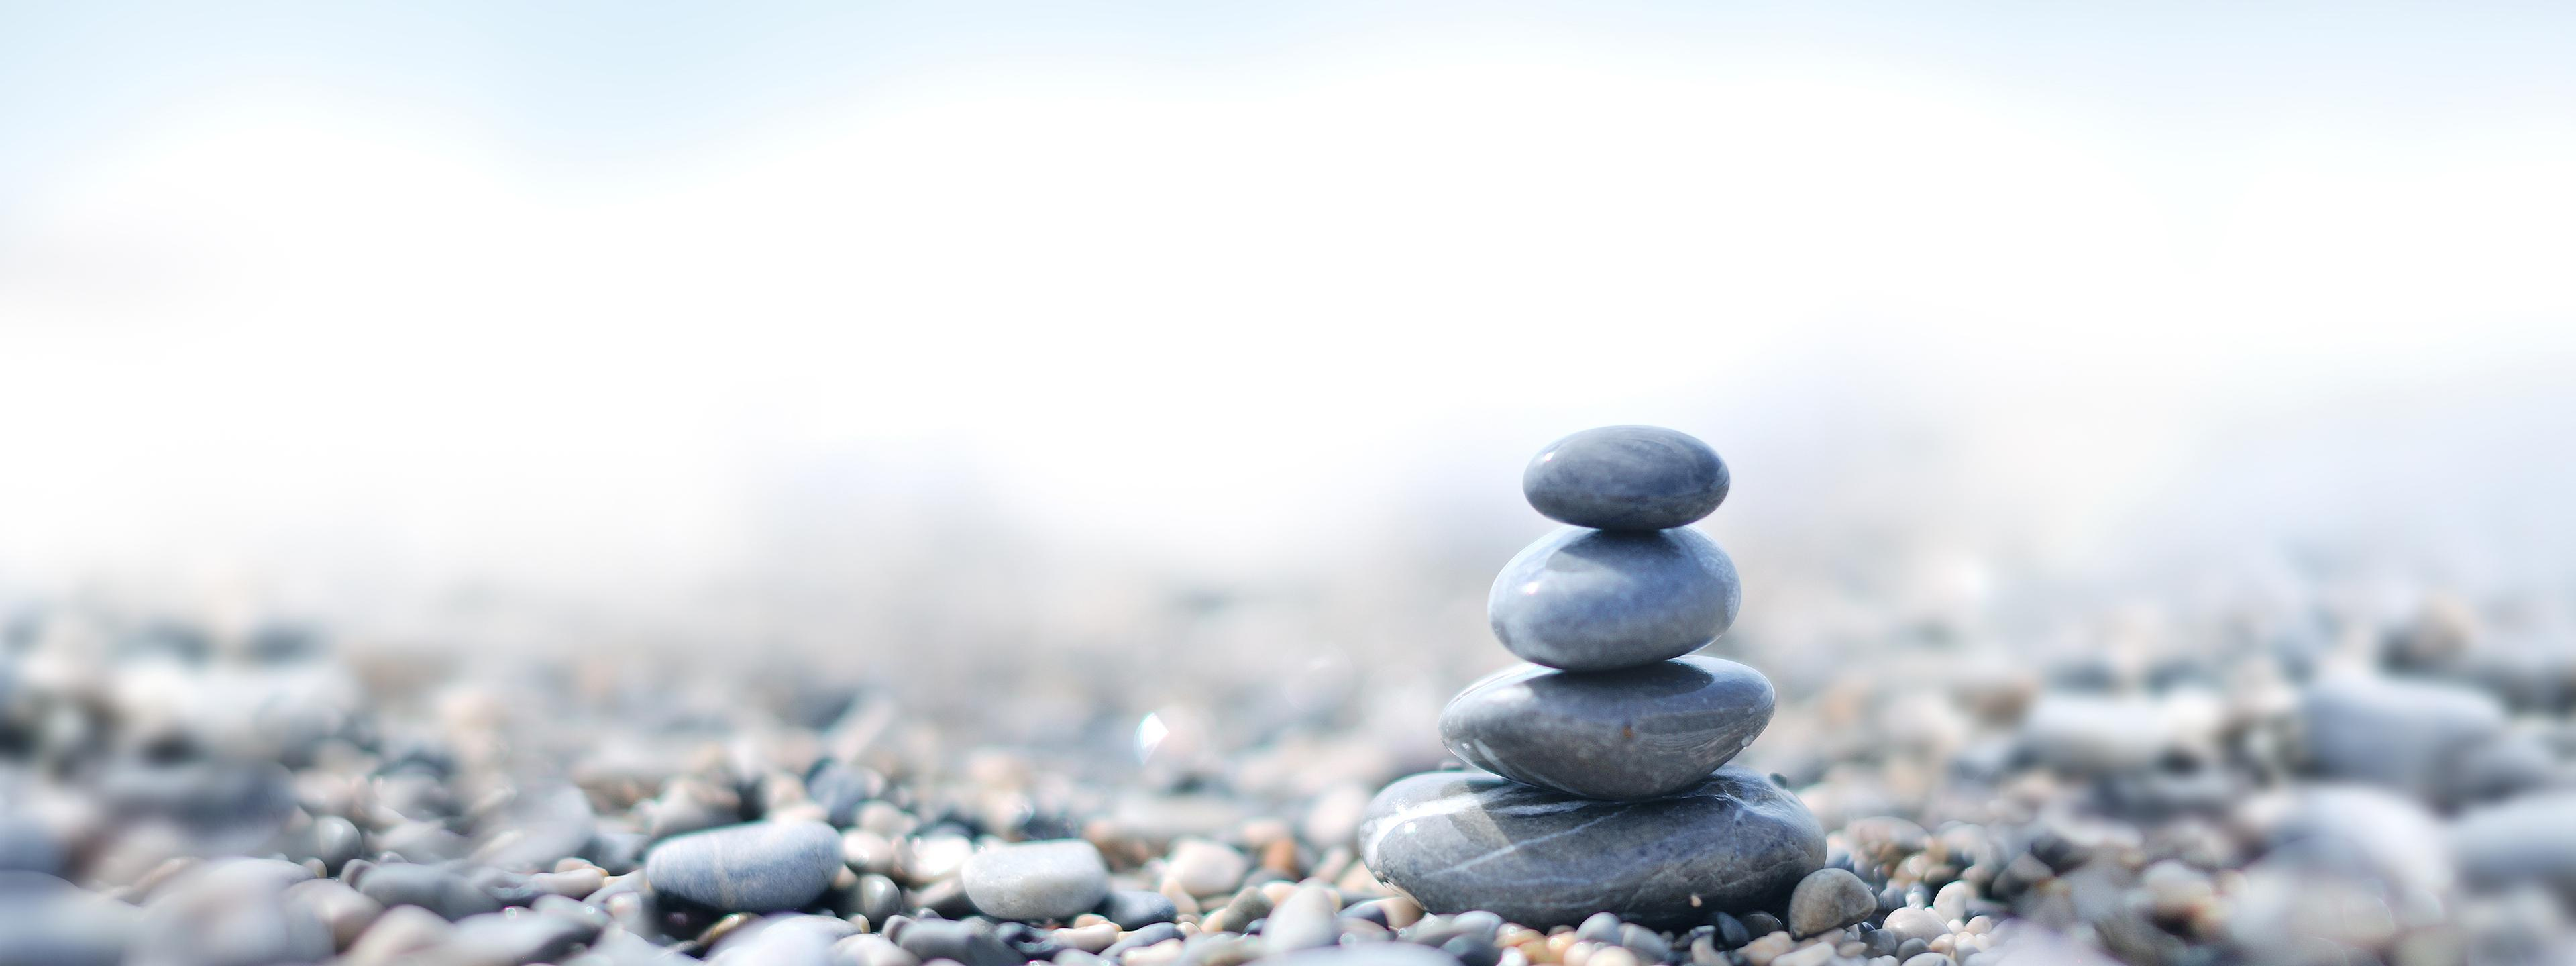 BRITA sustainability steeple of stones